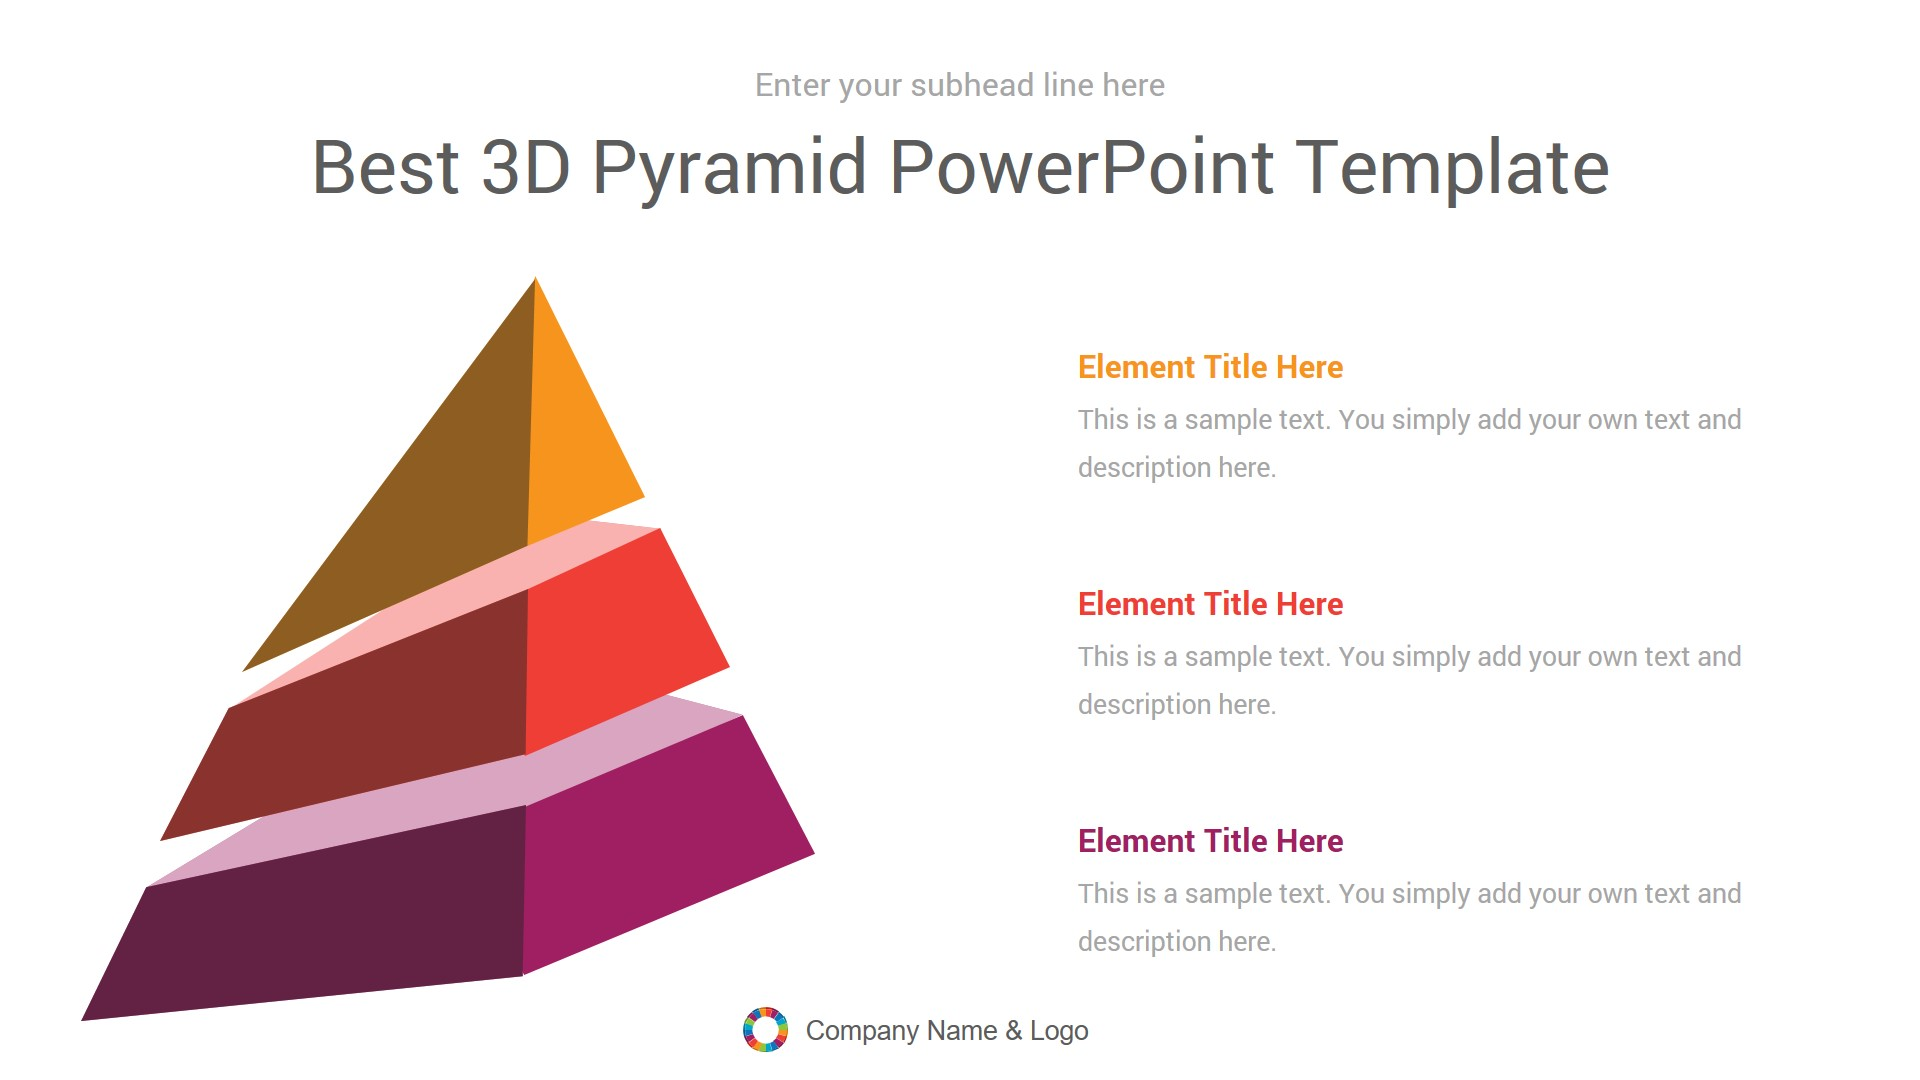 Best 3D Pyramid PowerPoint Template